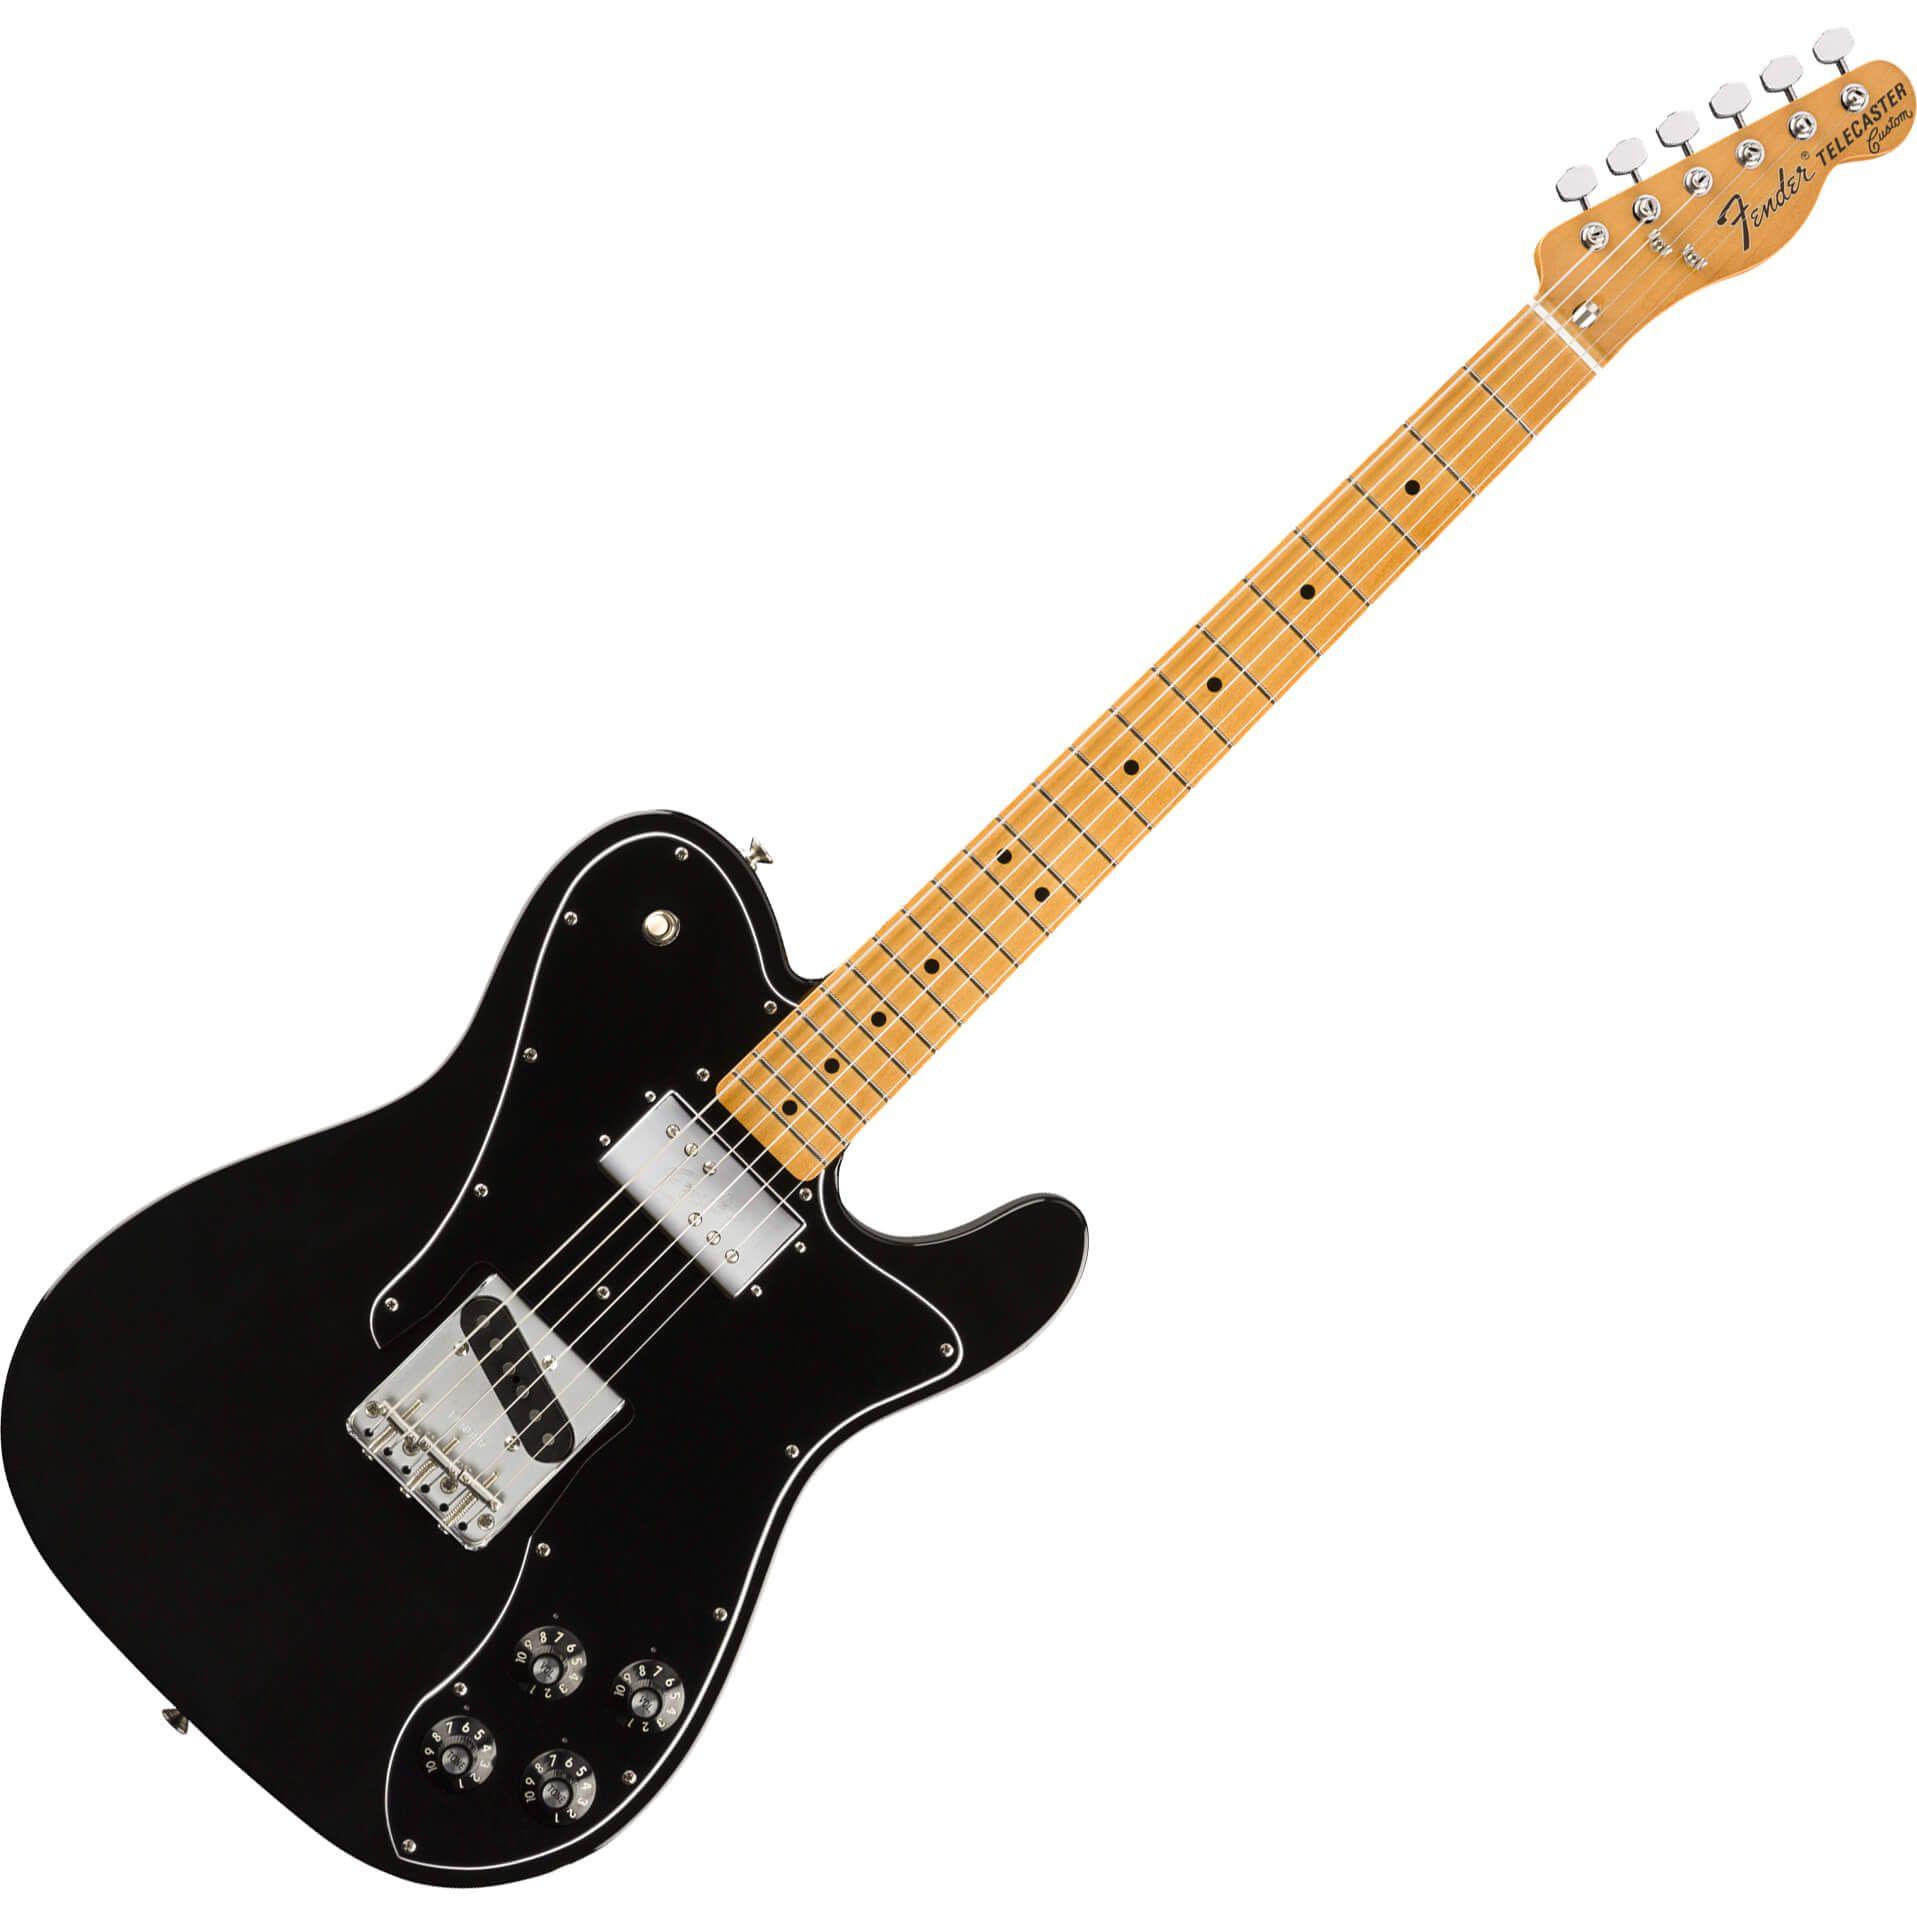 Fender Vintera Series 70s Telecaster Custom - MN - Black